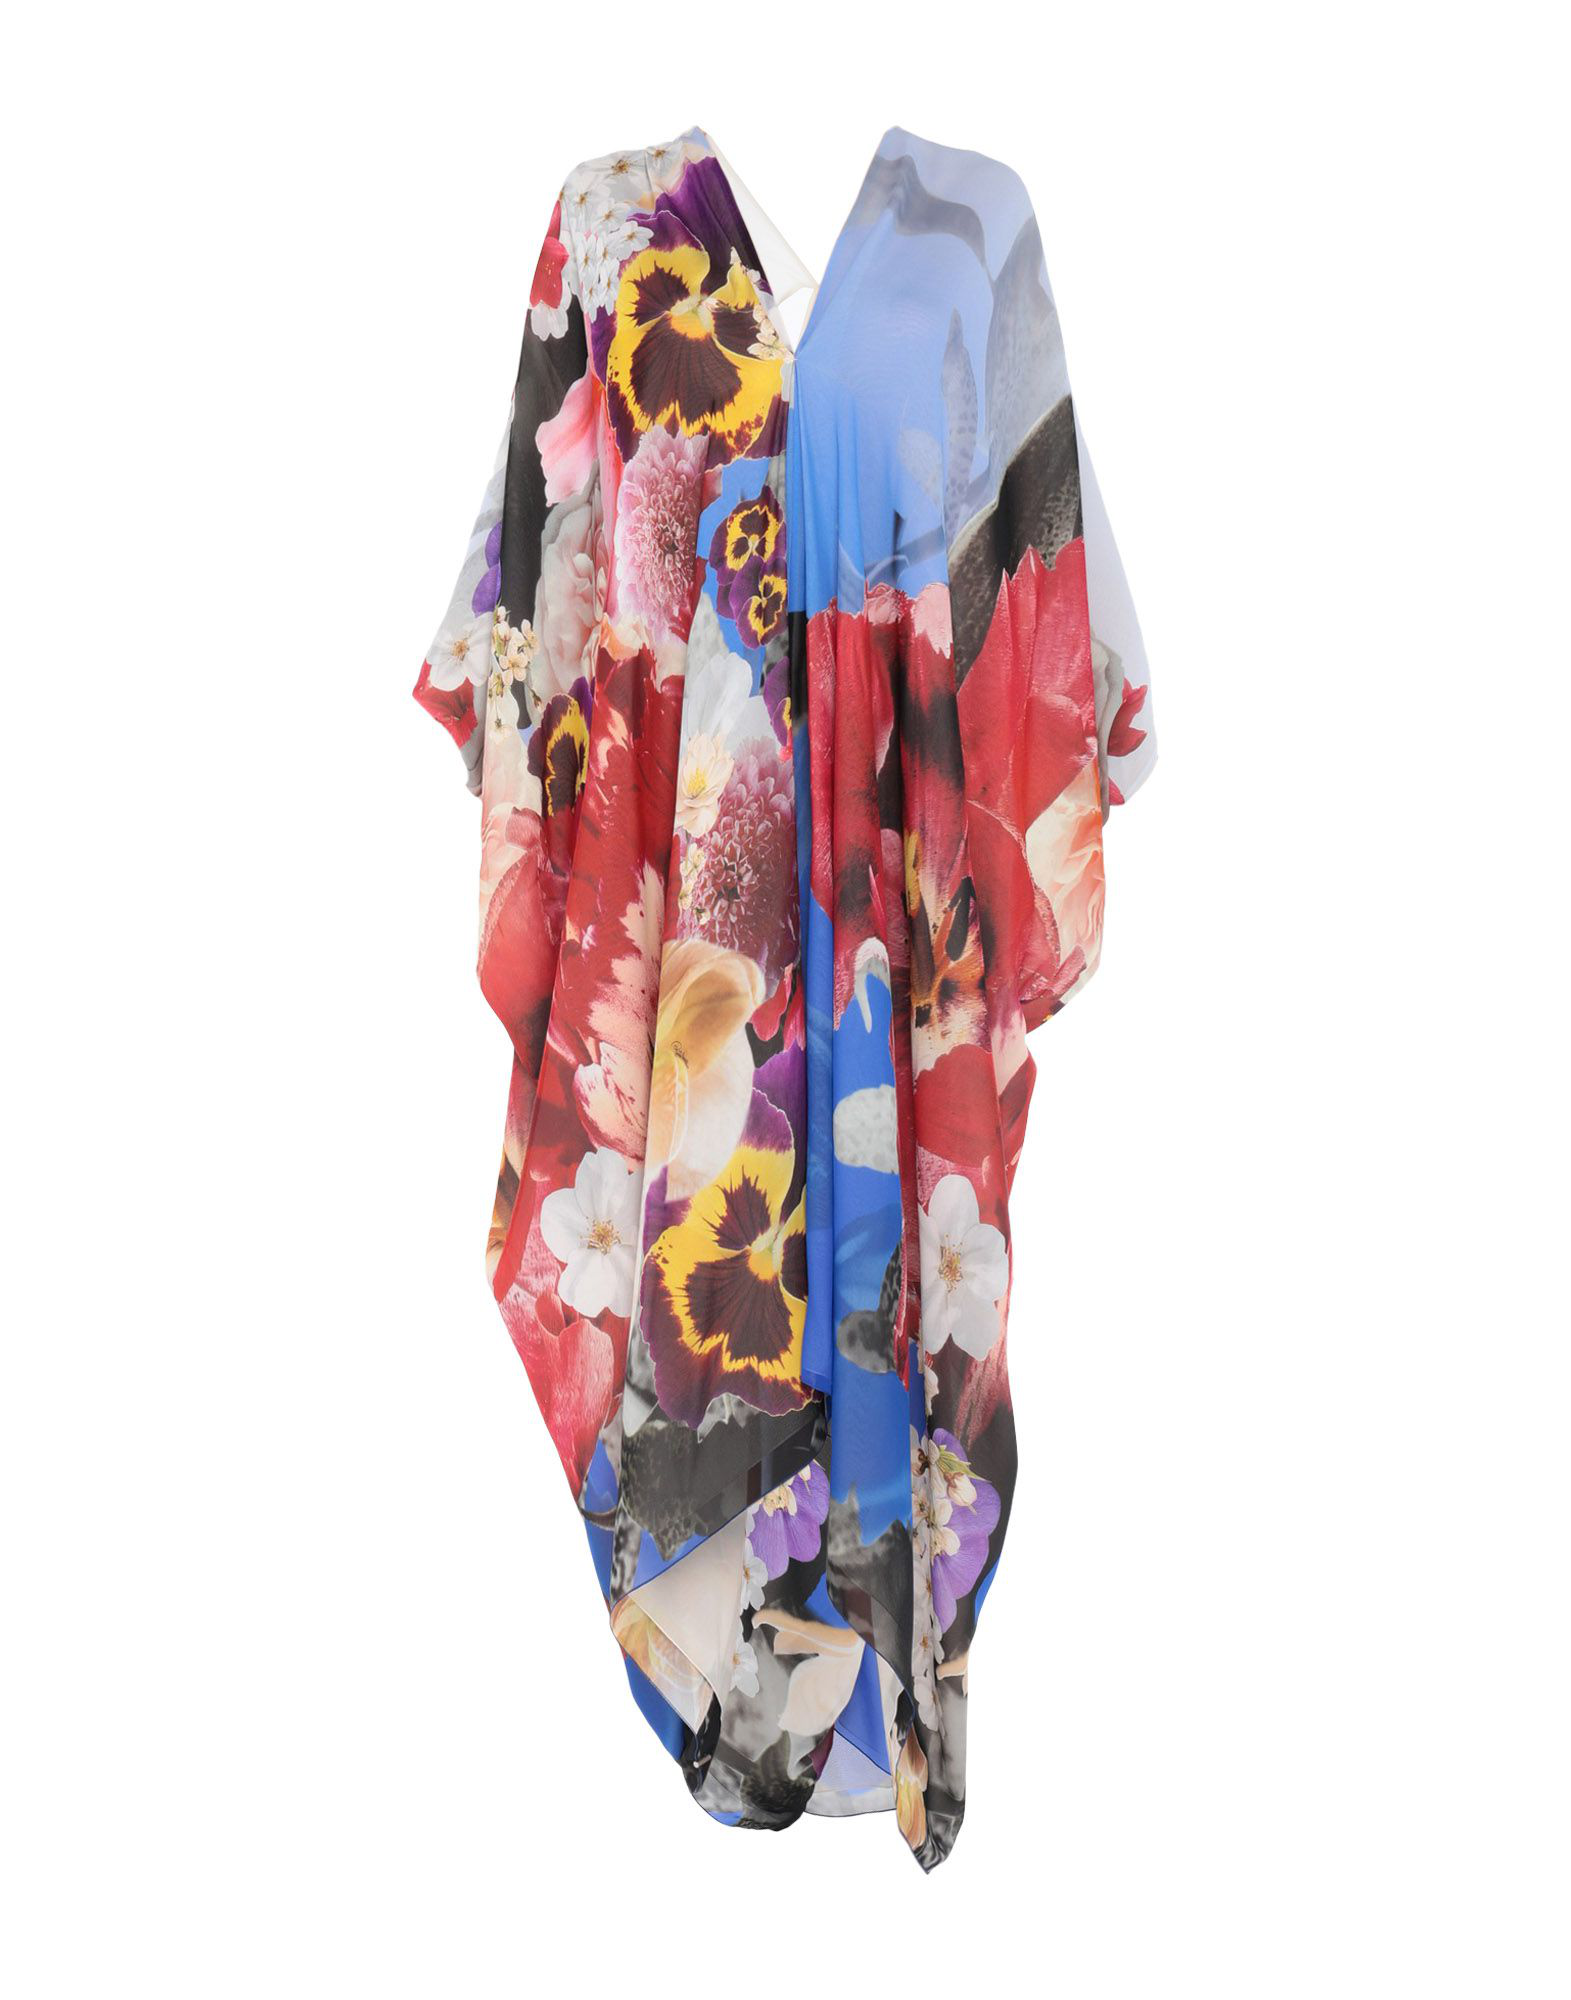 Roberto Cavalli Formal Dress In Garnet